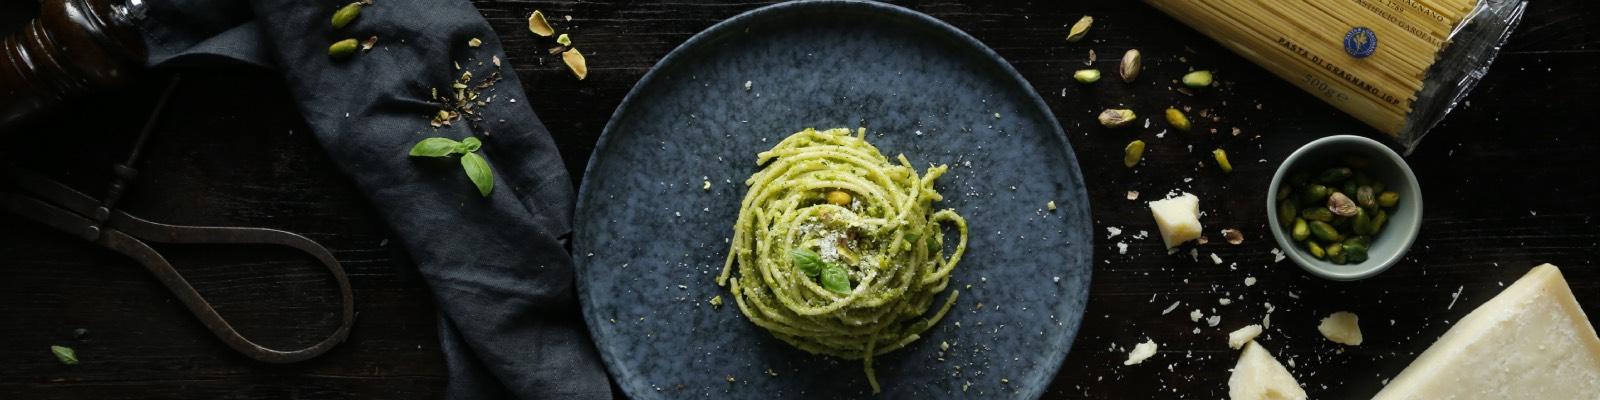 Pasta Garofalo - Spaghetti con salsa pesto de pistacho